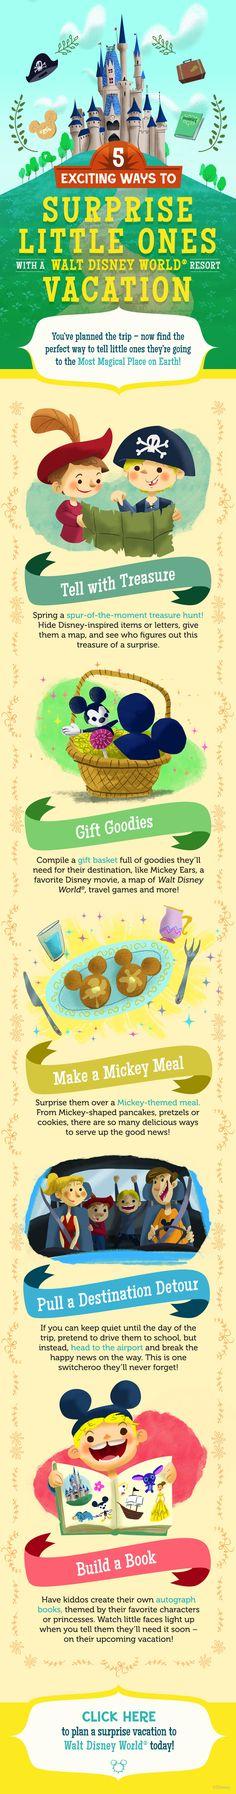 5 Ways to Surprise Little Ones with a Walt Disney World Vacation! #DisneyKids #tips #tricks